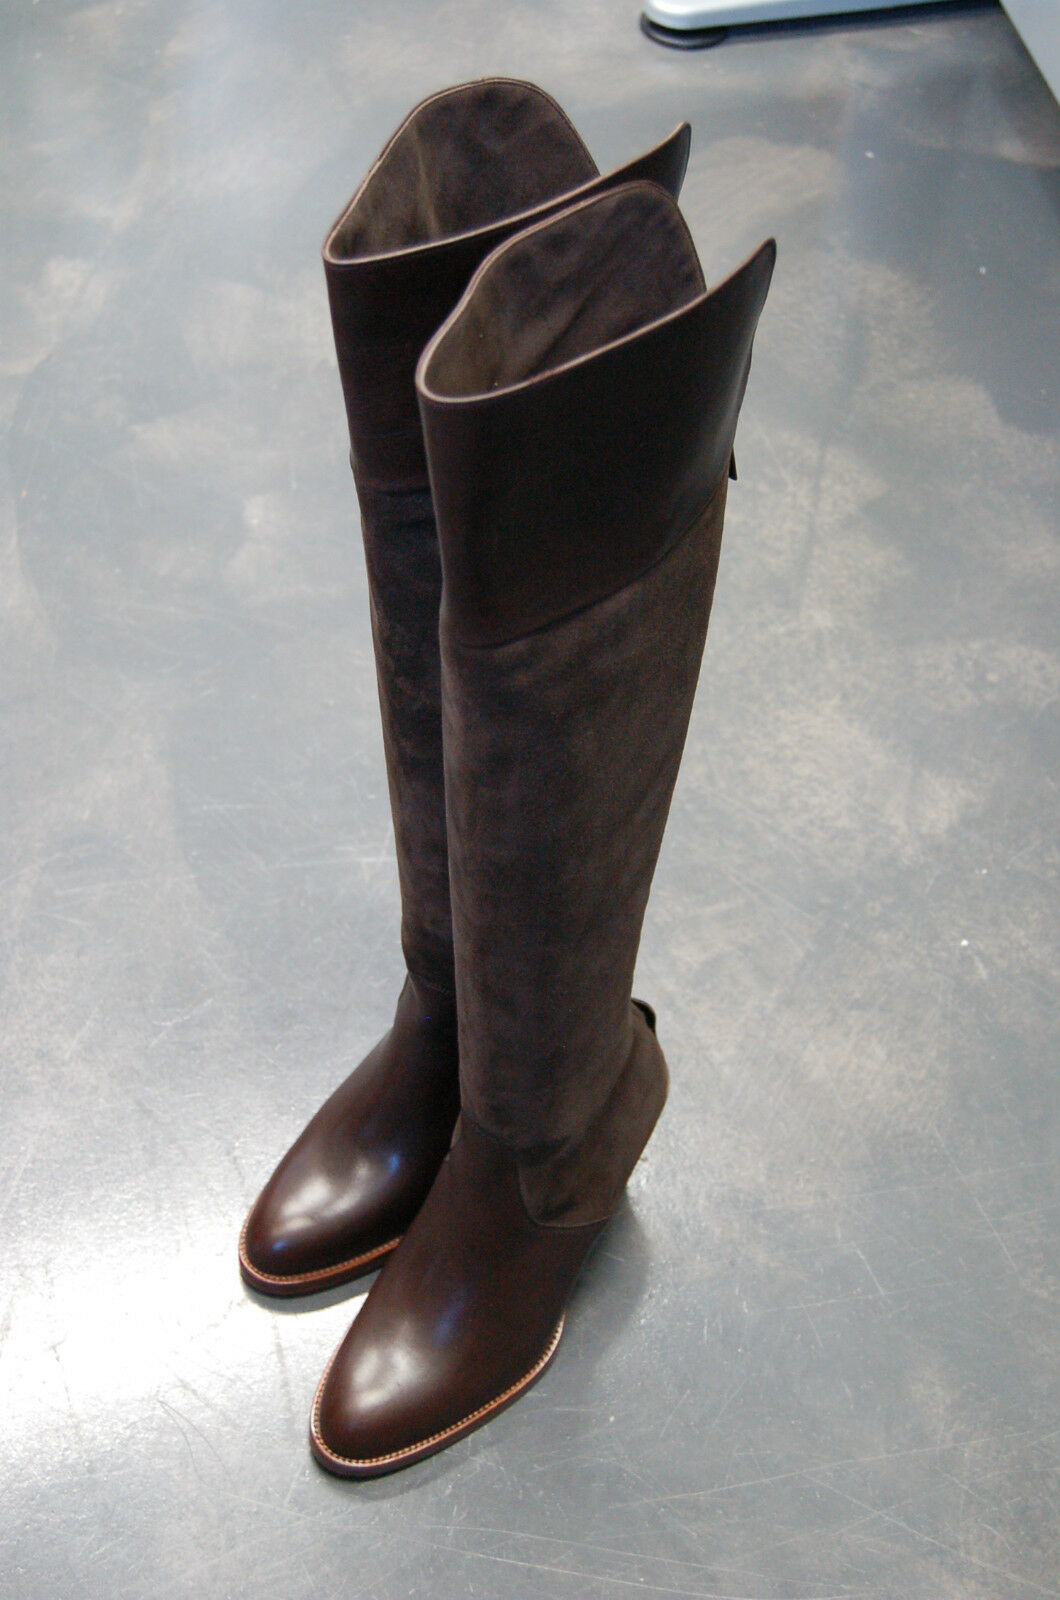 STIVALE femmes -37-WOMAN démarrage- VITELLO+CAMOSCIO marron-CALF+SUEDE marron-LTH SOLE